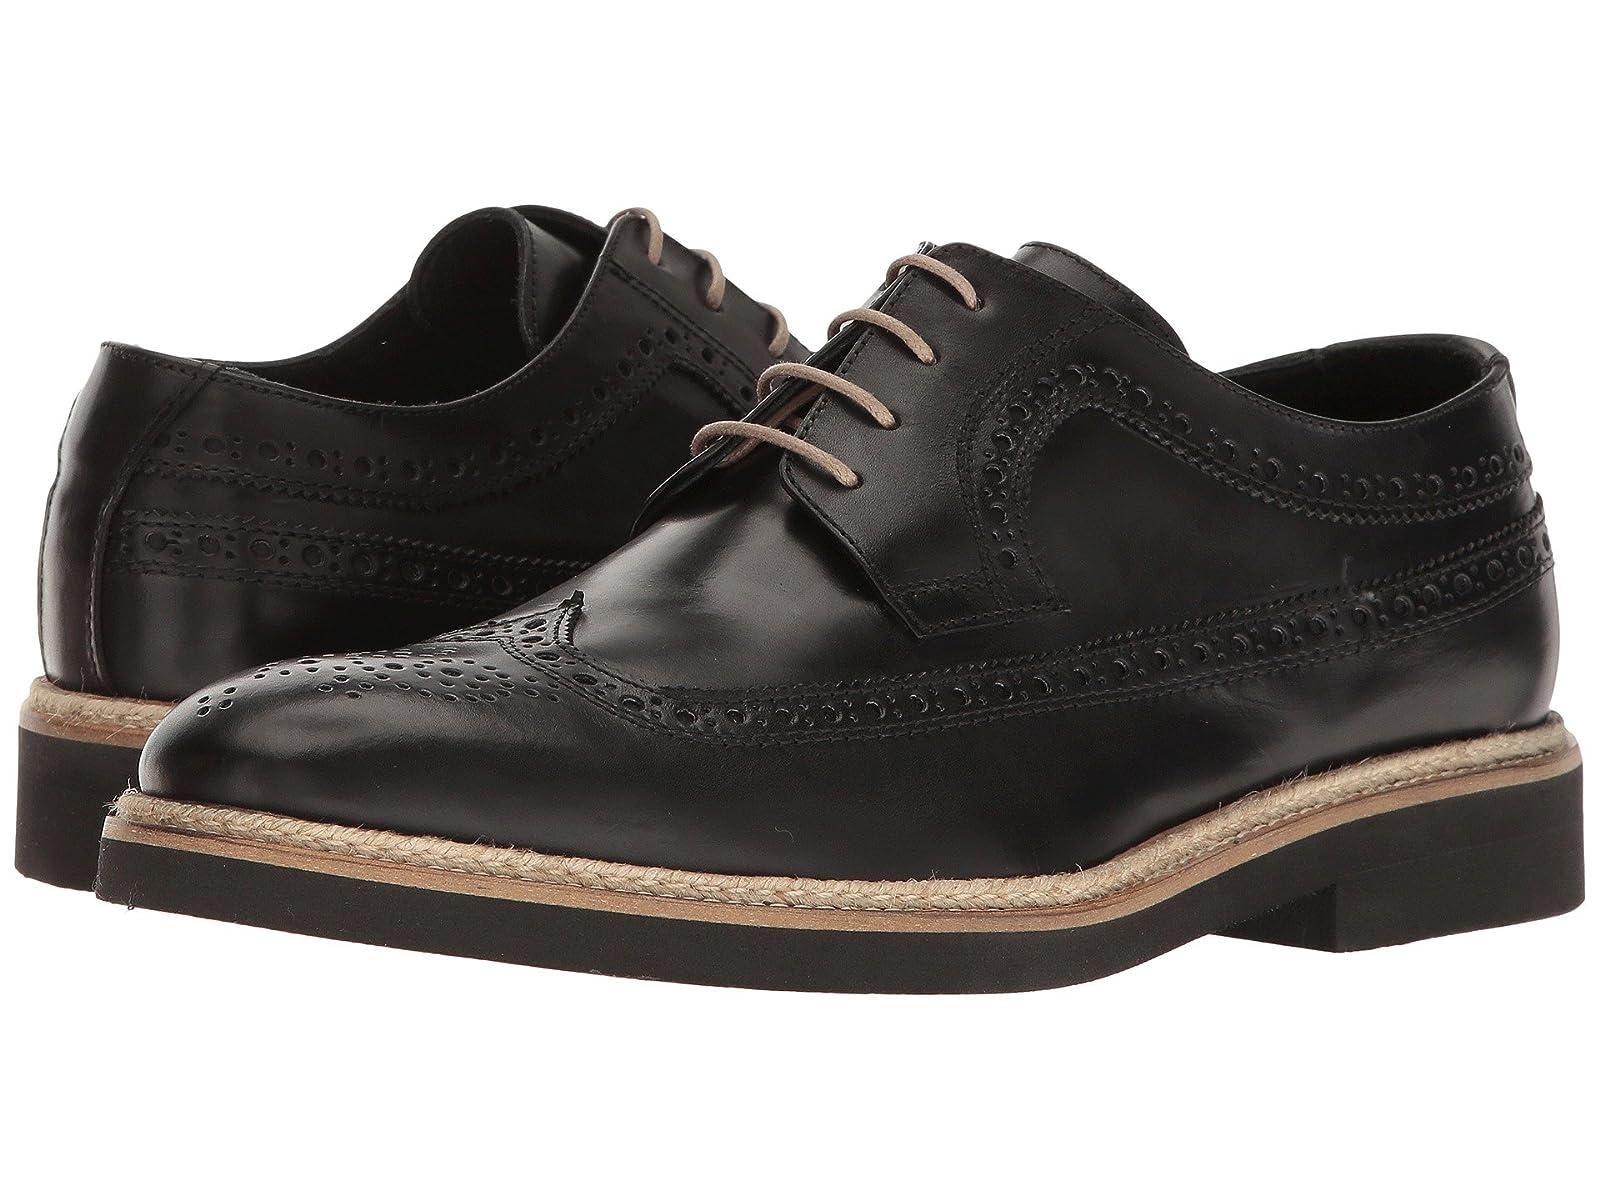 BUGATCHI Sondrio DerbyCheap and distinctive eye-catching shoes